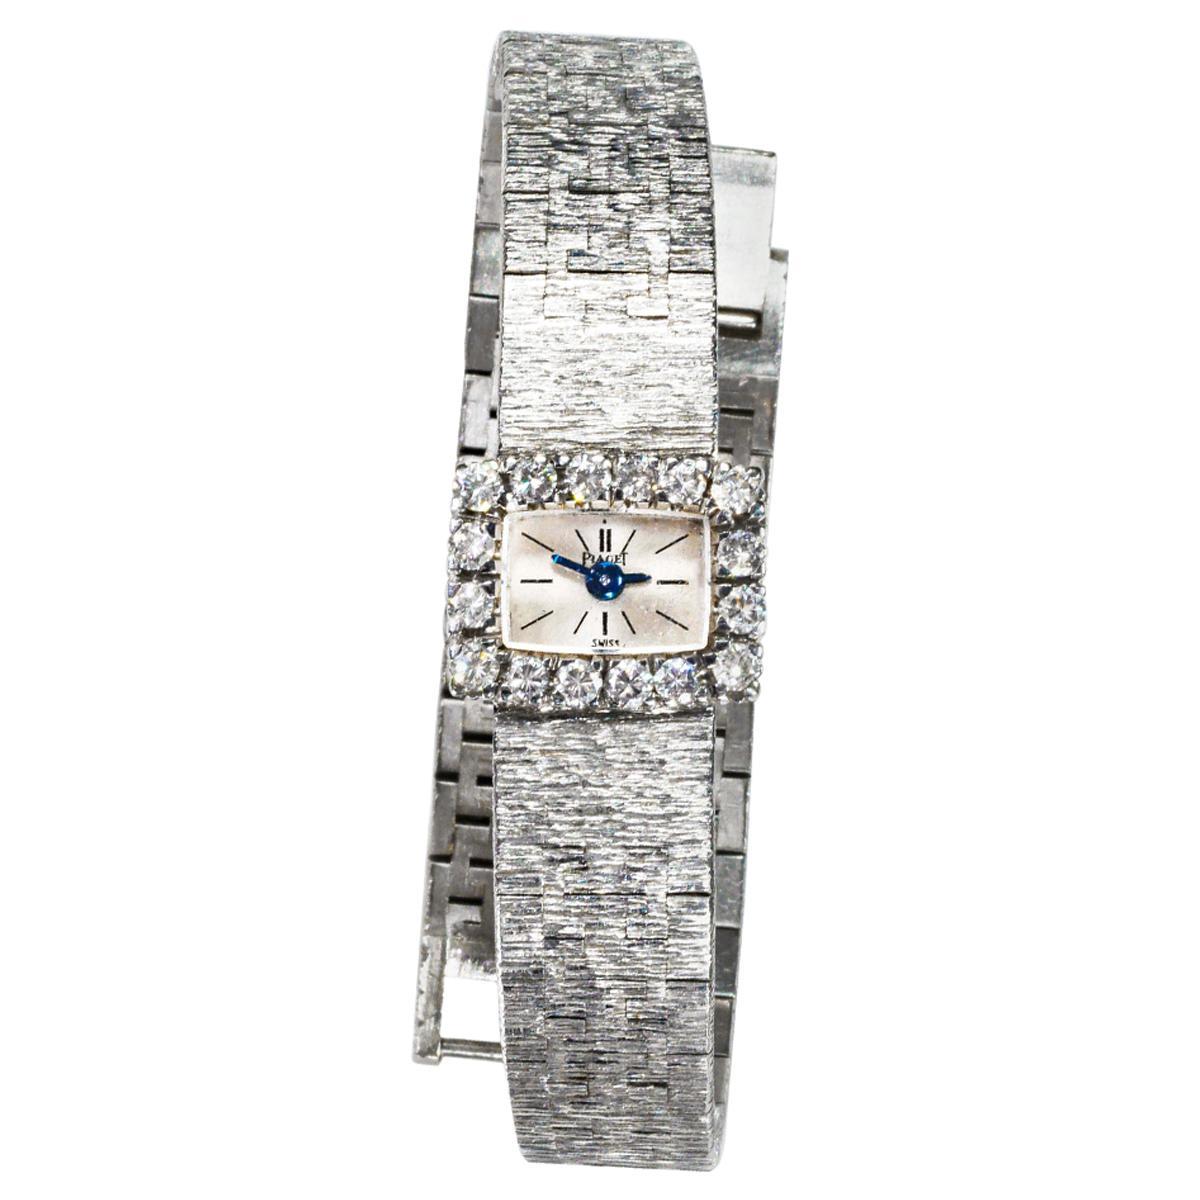 1970s Piaget 18 Karat White Gold Diamond Set Square Bracelet Wristwatch